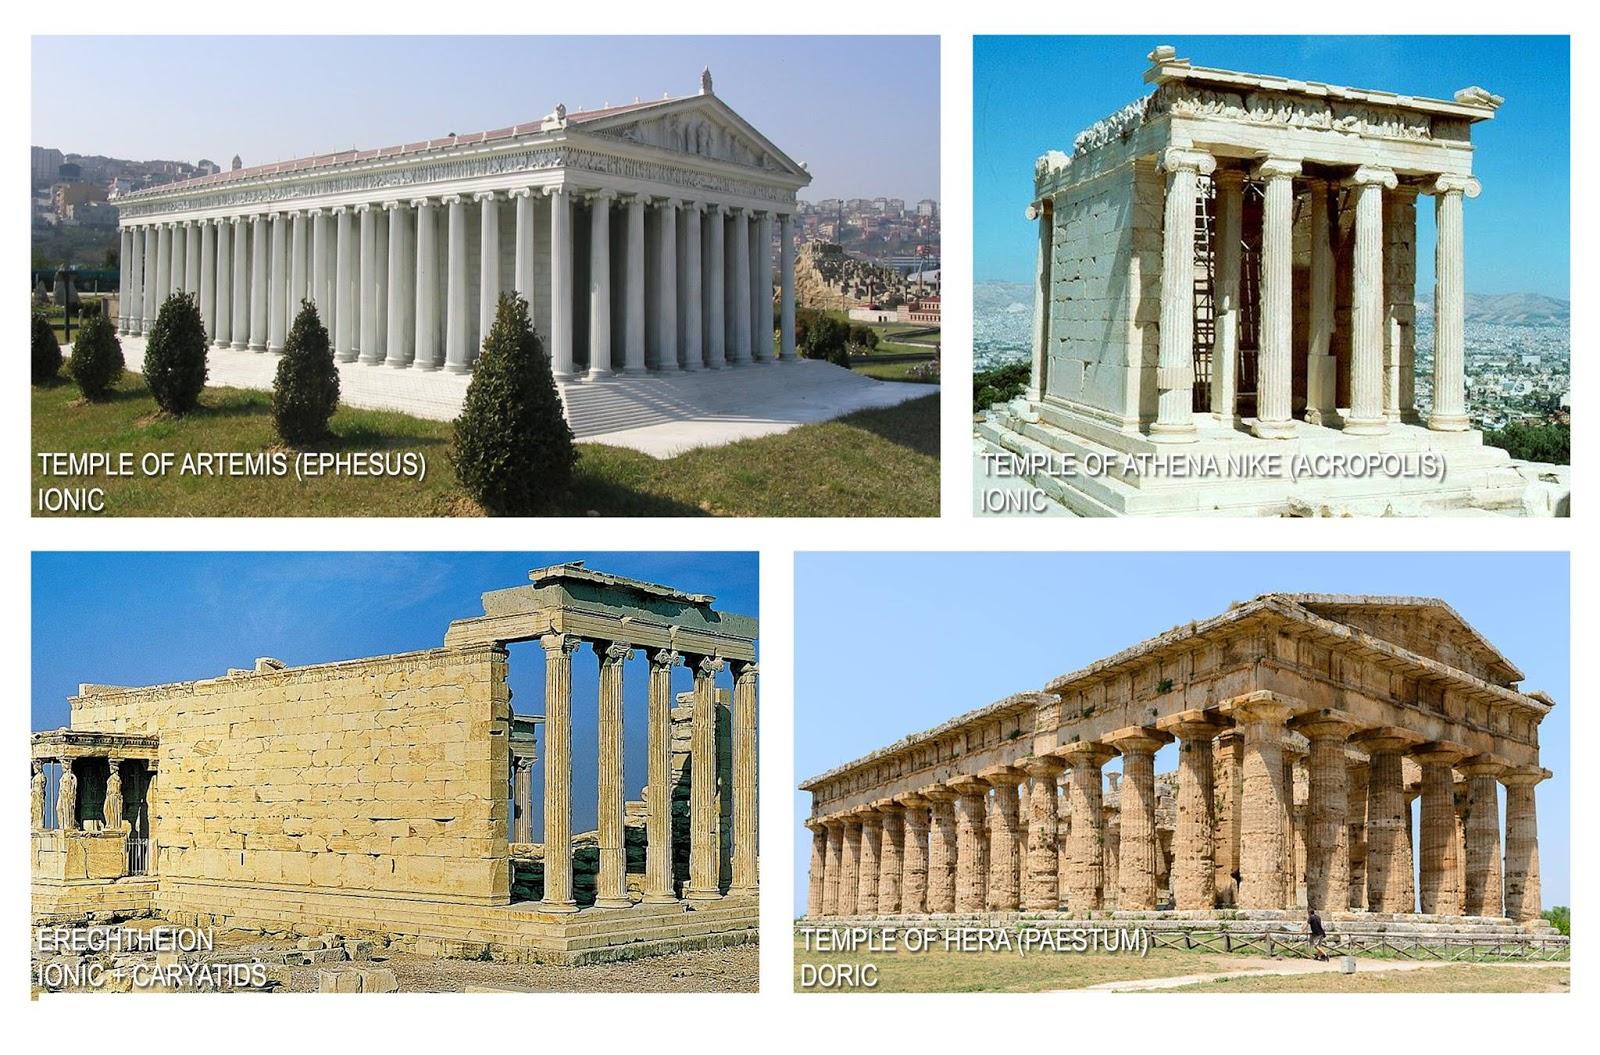 hight resolution of  visit ancient greece com temple of athena nike brothersoft com erechtheion norbert nagel via wikipedia temple of hera paestum